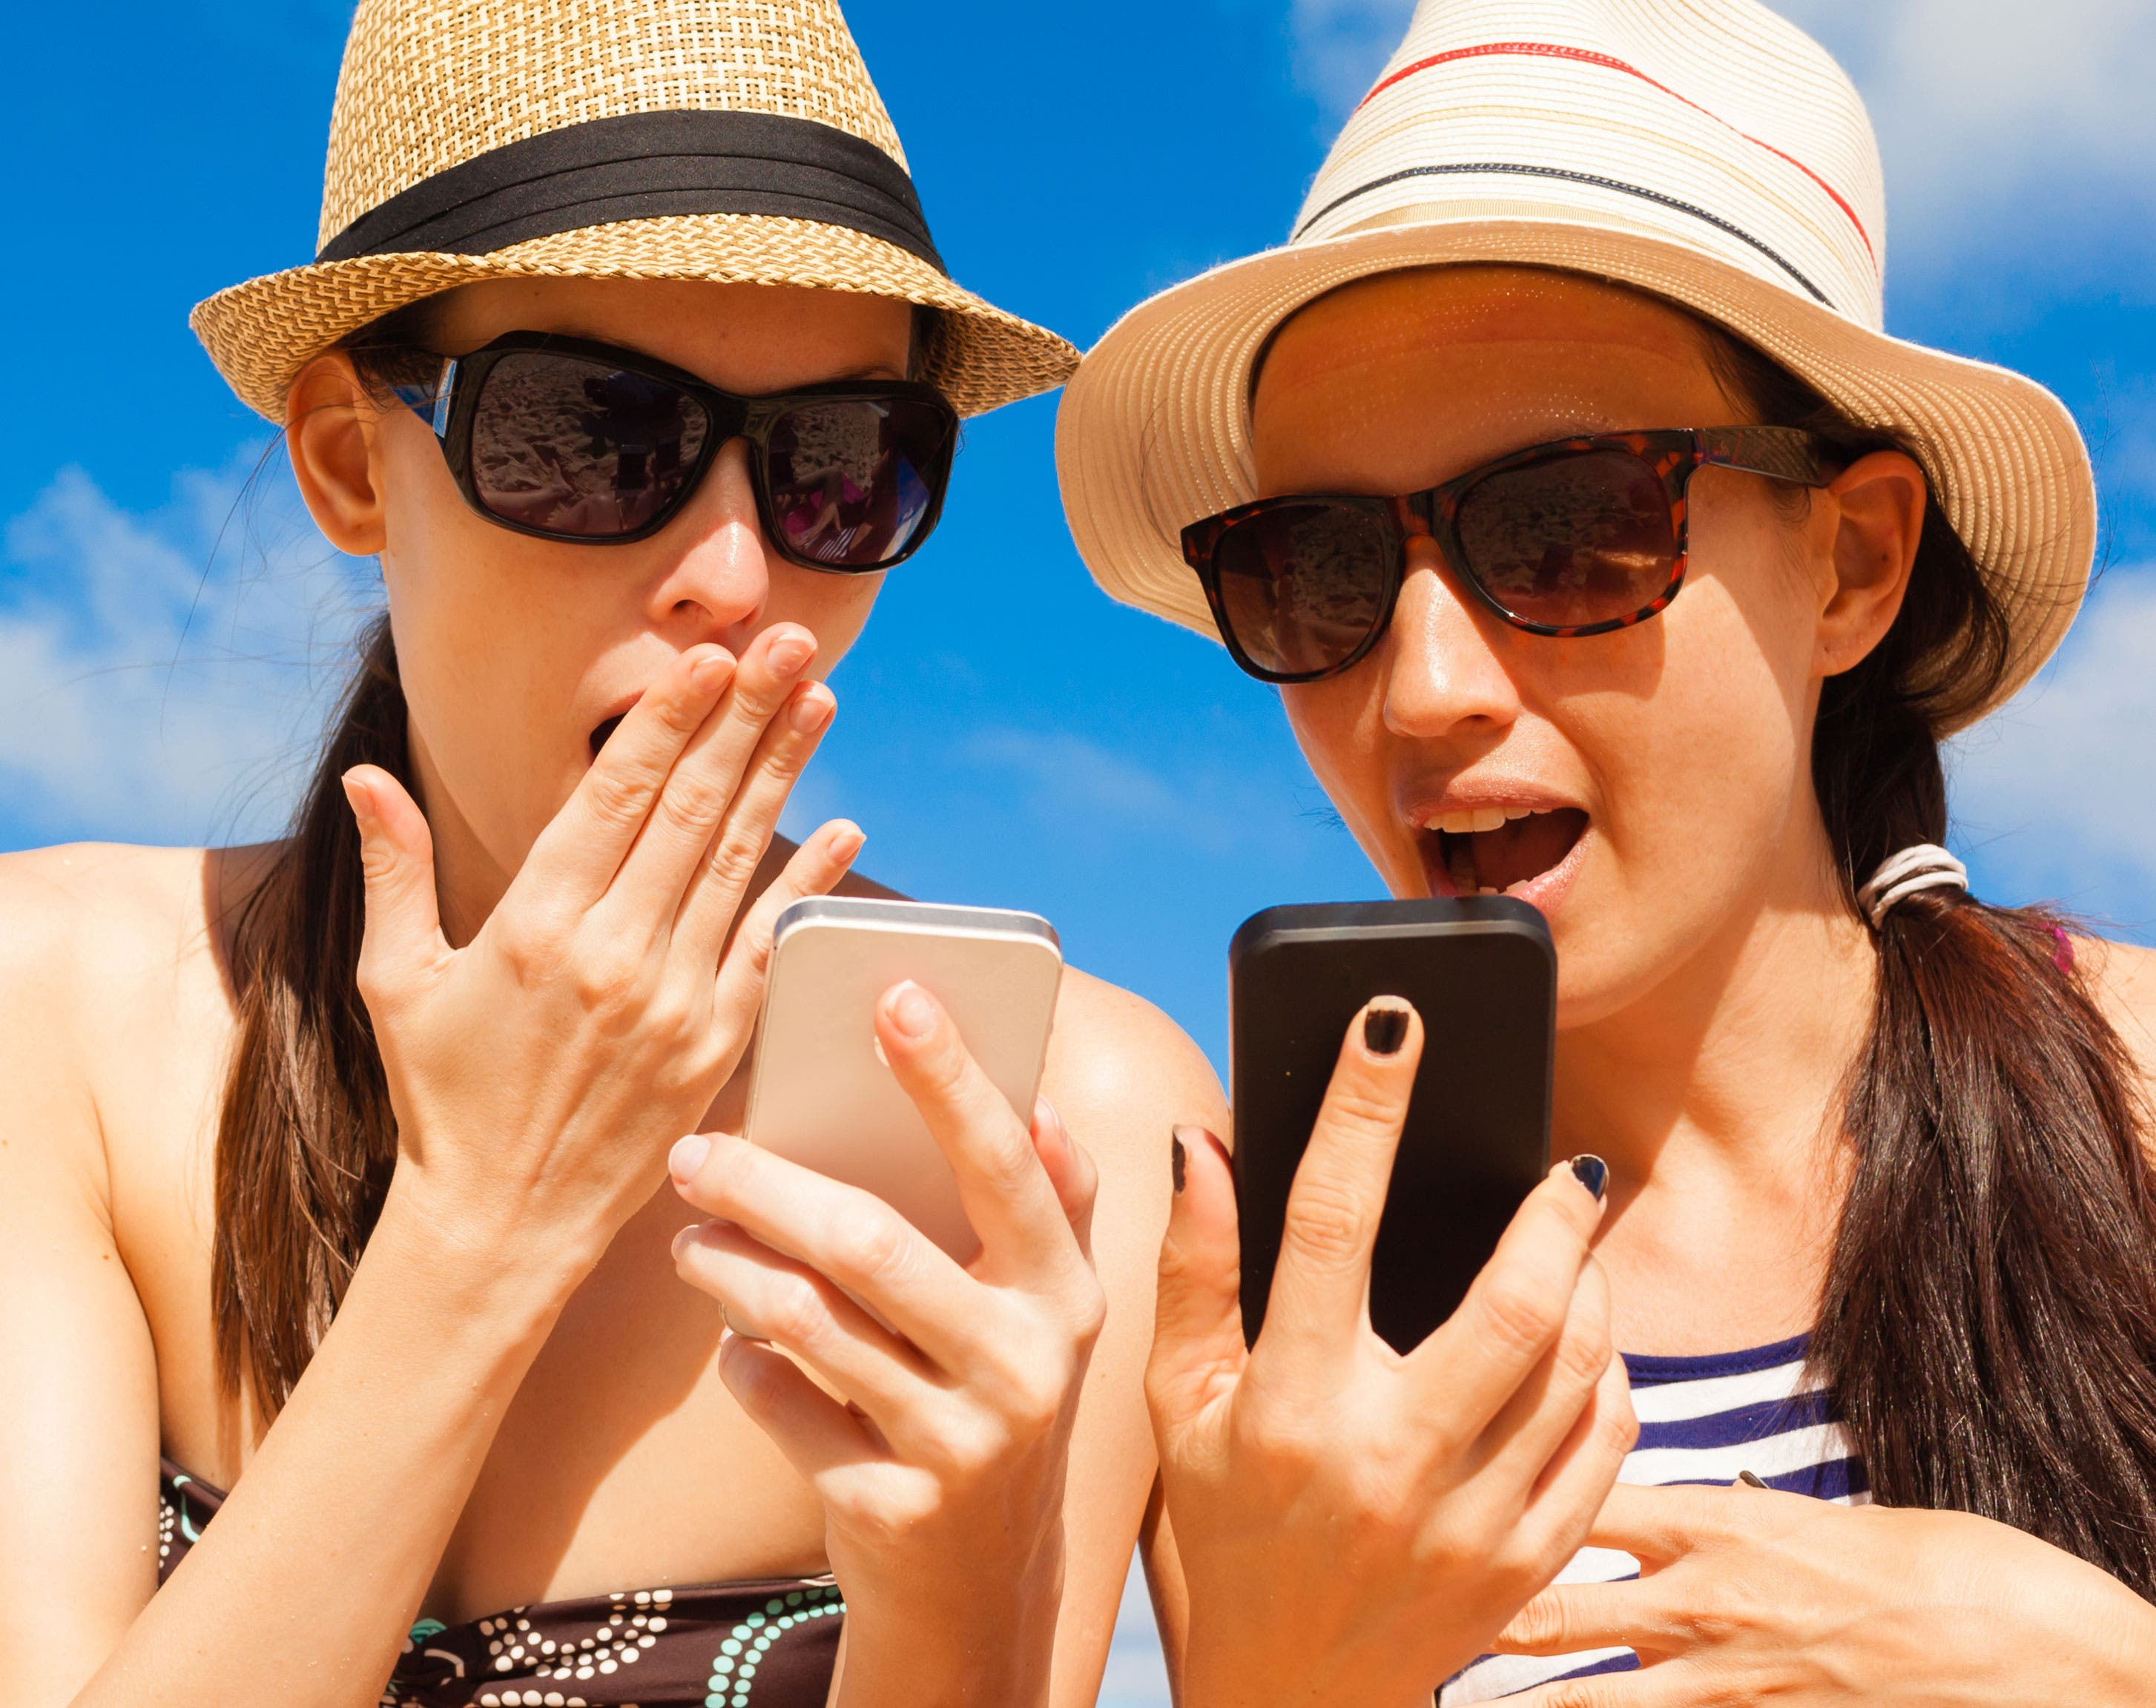 teenagers using iPhones